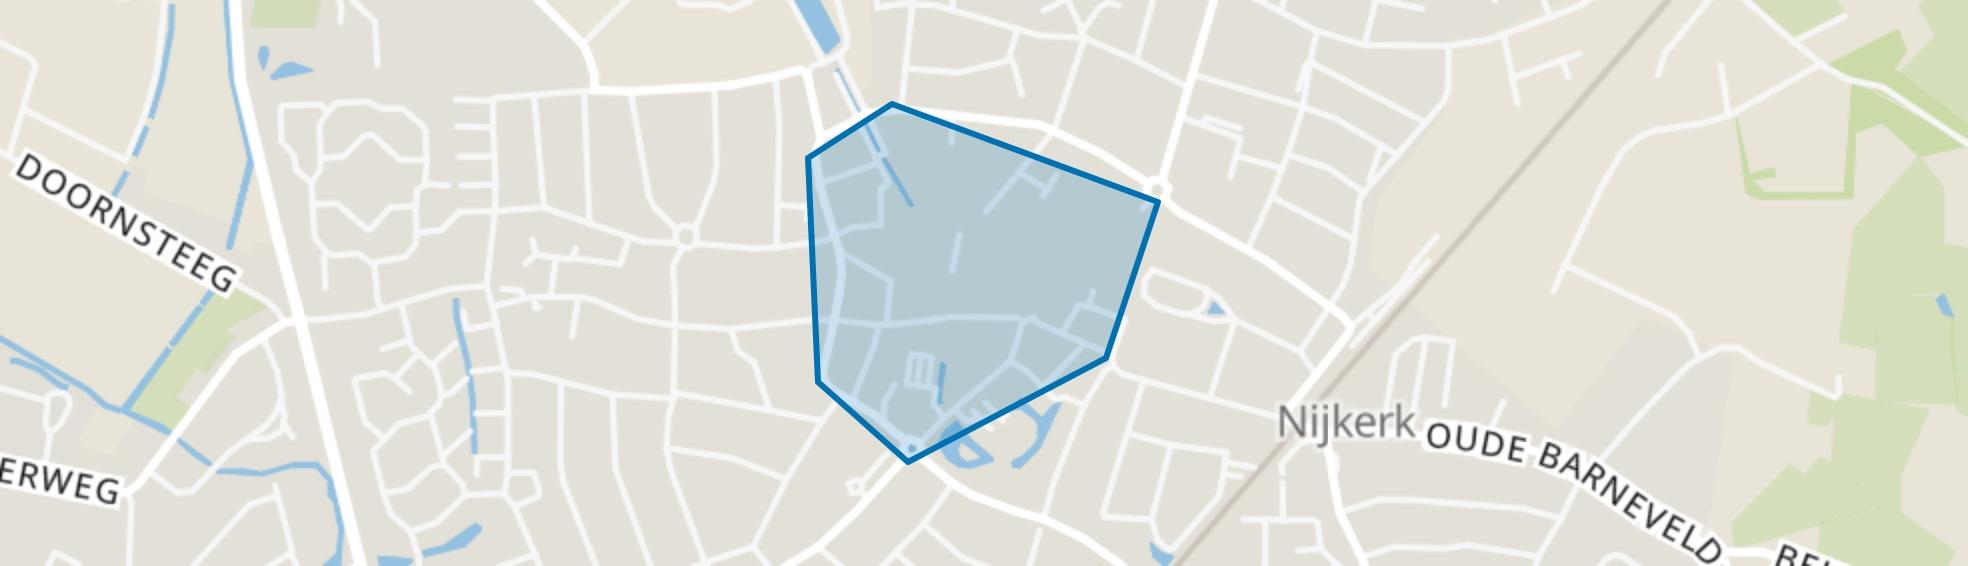 Centrum, Nijkerk map